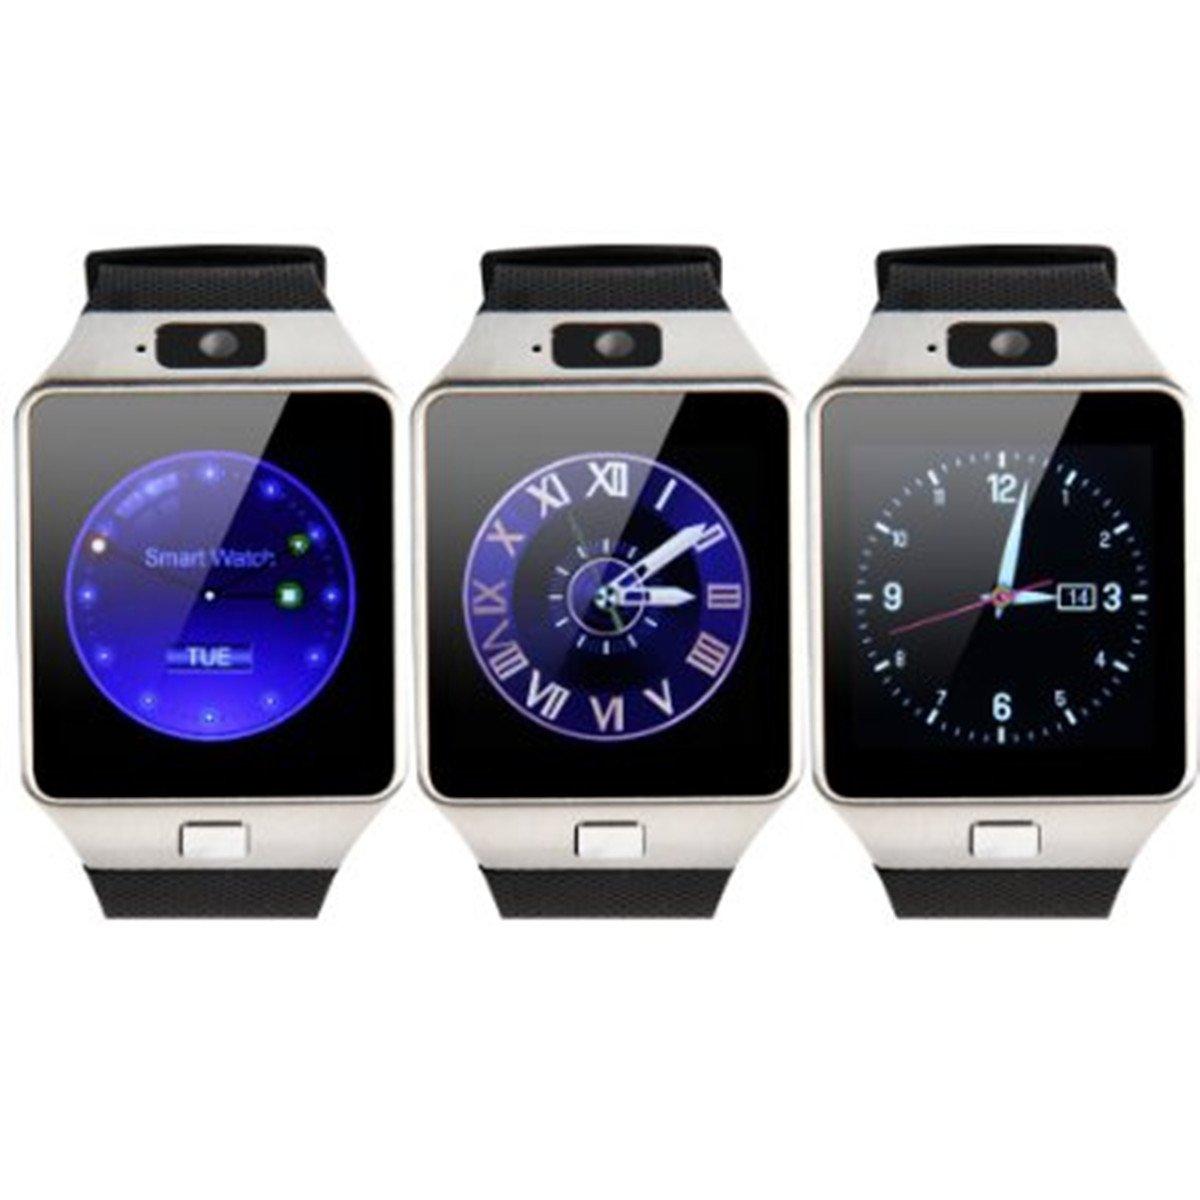 VOSMEP SmartWatch Reloj Inteligente Bluetooth 3.0 Teléfono Inteligente Pulsera Pantalla Cámara Táctil para Android Samsung HTC LG Huawei Xiaomi Reloj ...